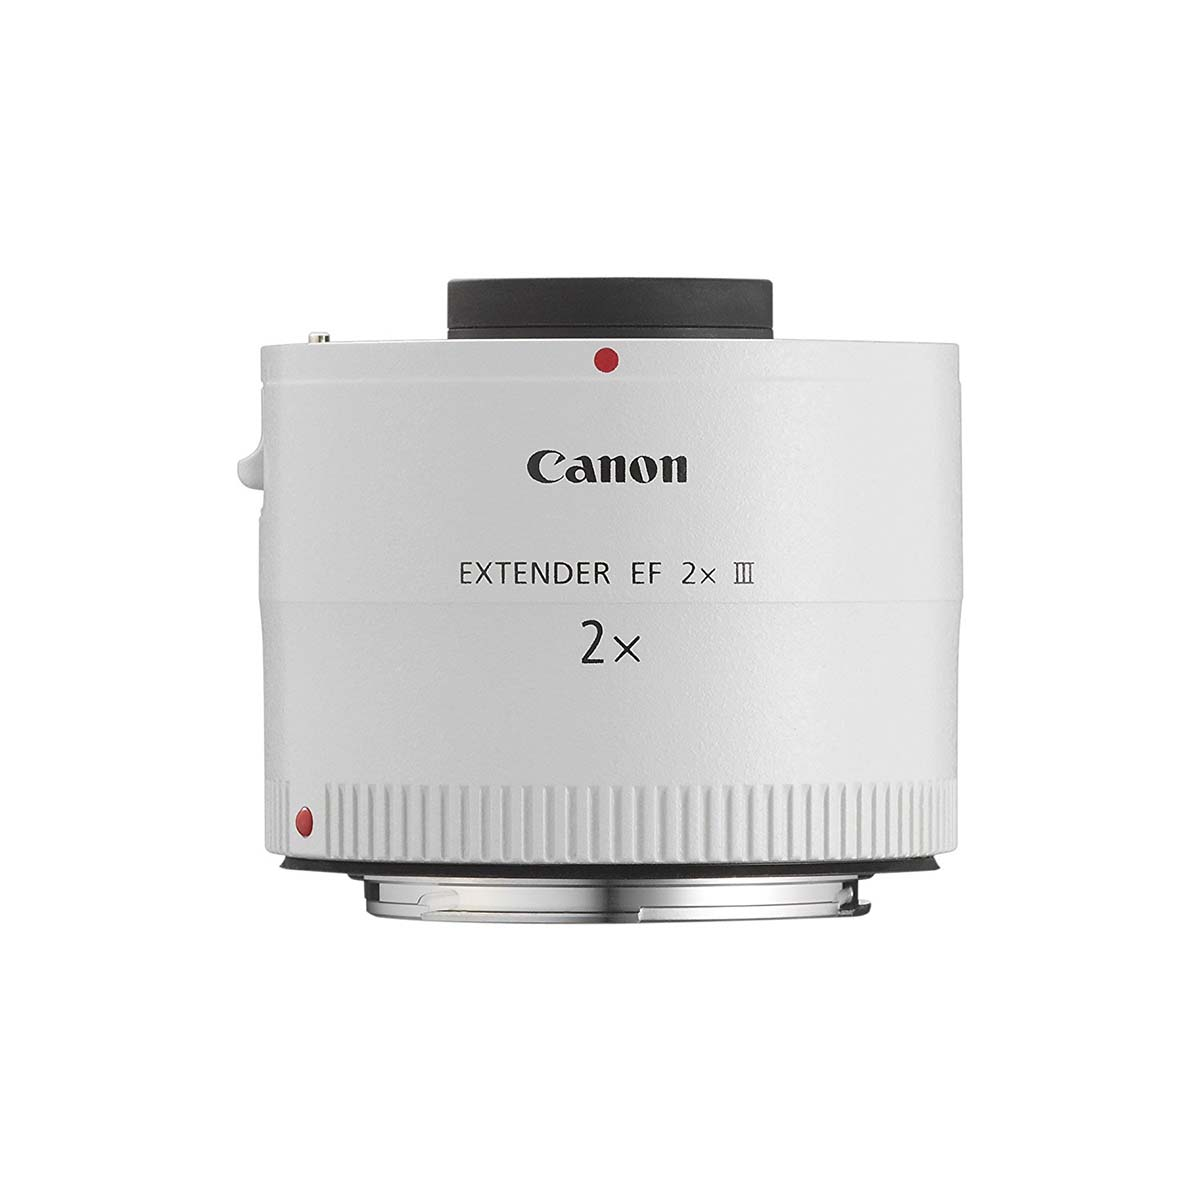 Immagine Canon 2x extender EF III